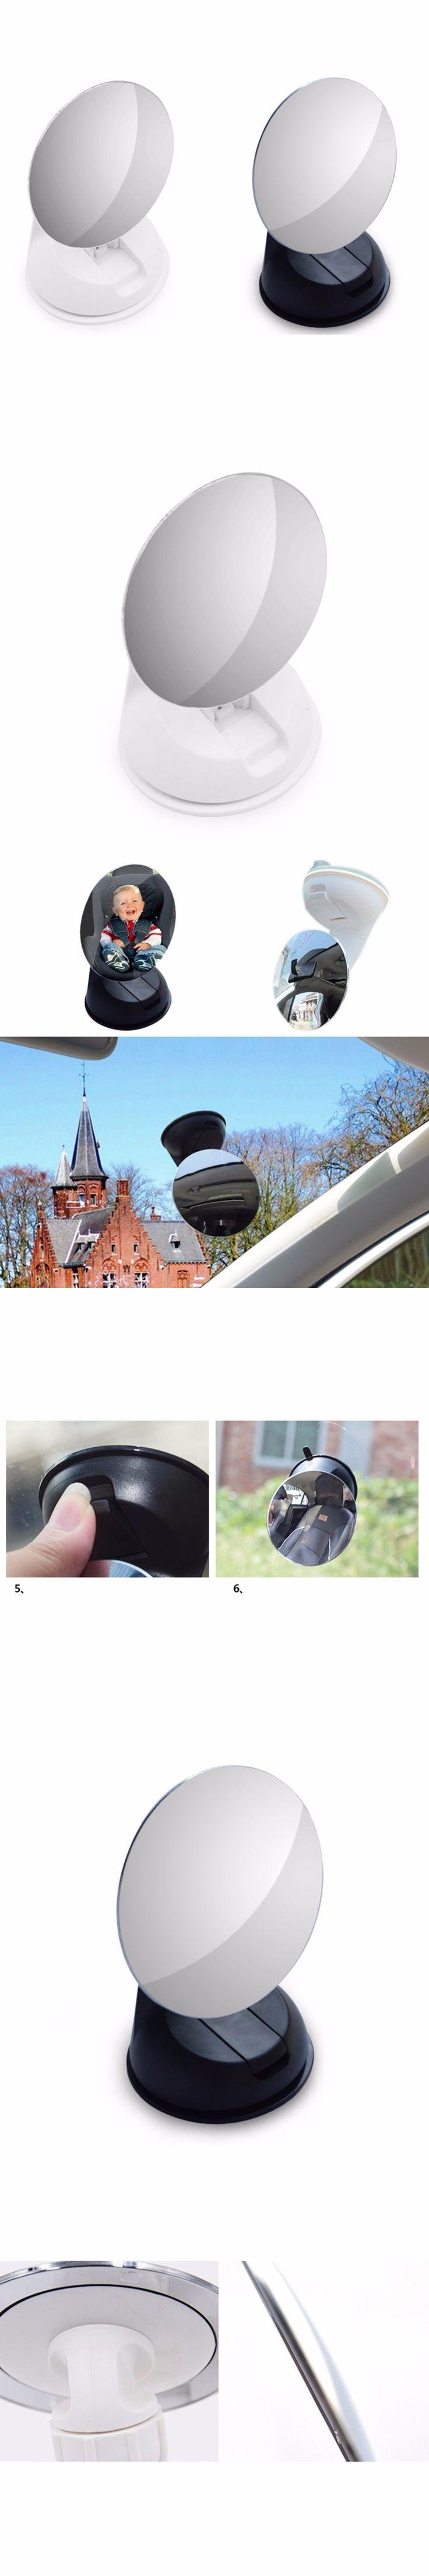 2017 New Adjustable Wide View Rear / Baby / Child Seat Car Safety Mirror Headrest Mount Interior Rearview Mirror